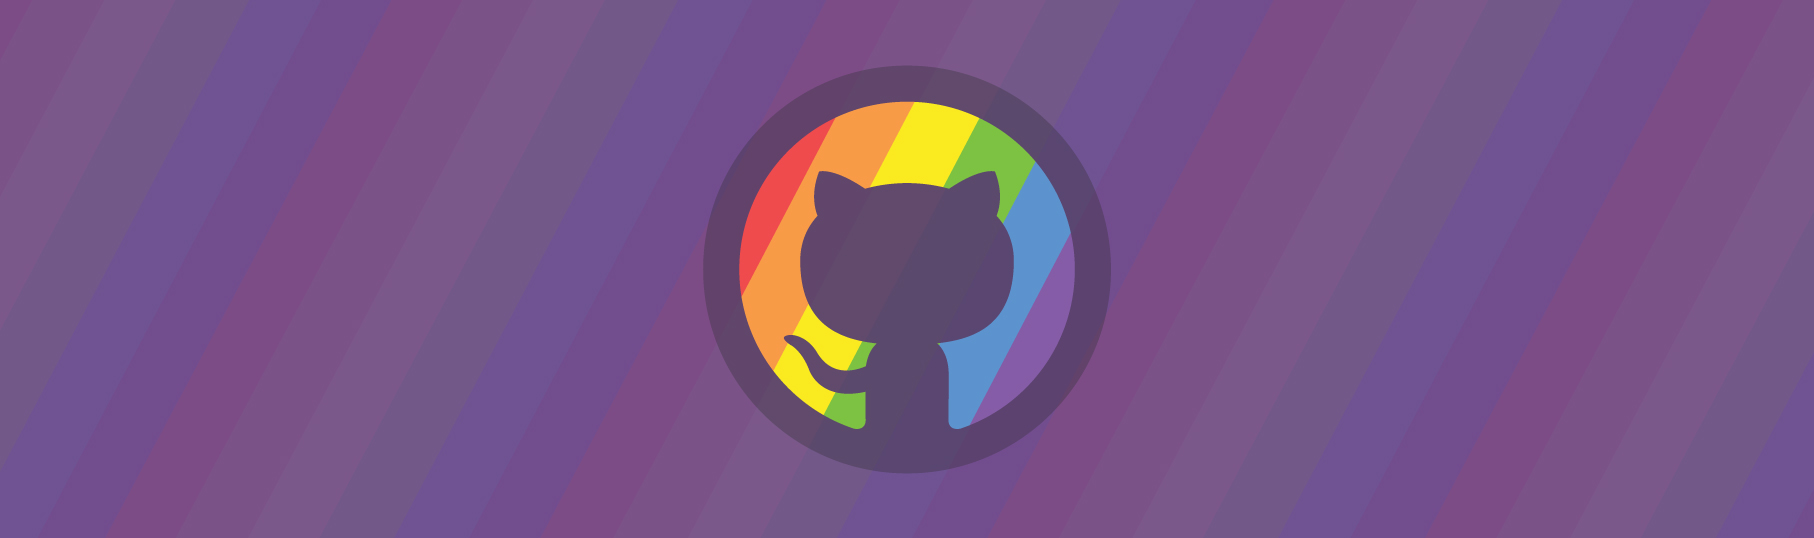 Octocat + Pride